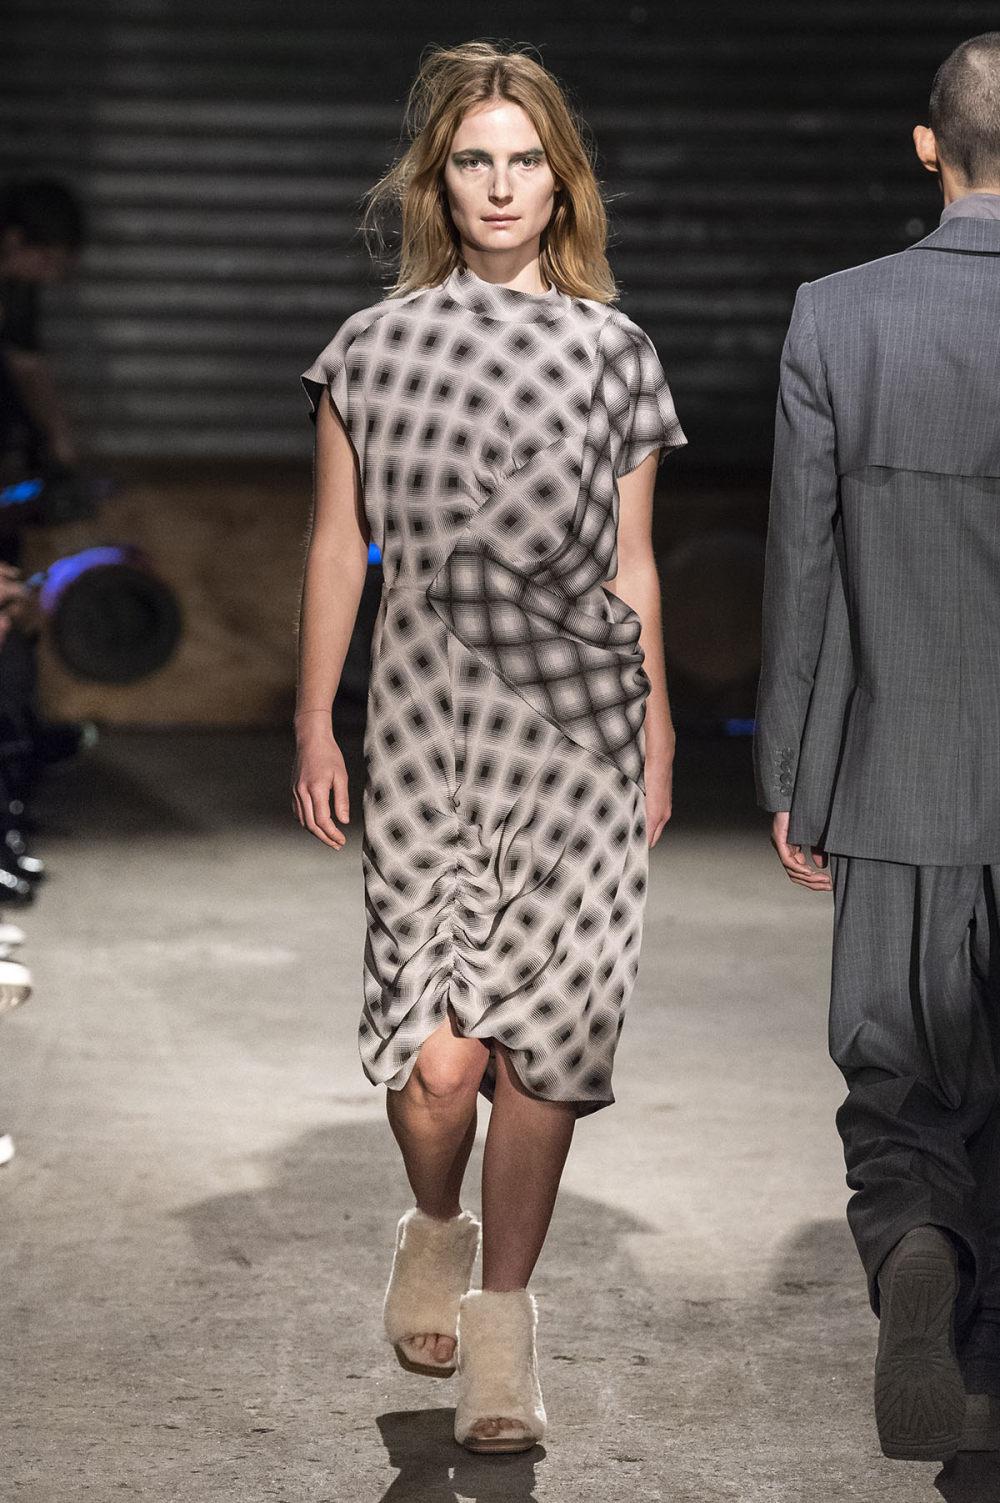 Eckhaus Latta时装系列采用了更加结构化的剪裁和图案提花-2.jpg